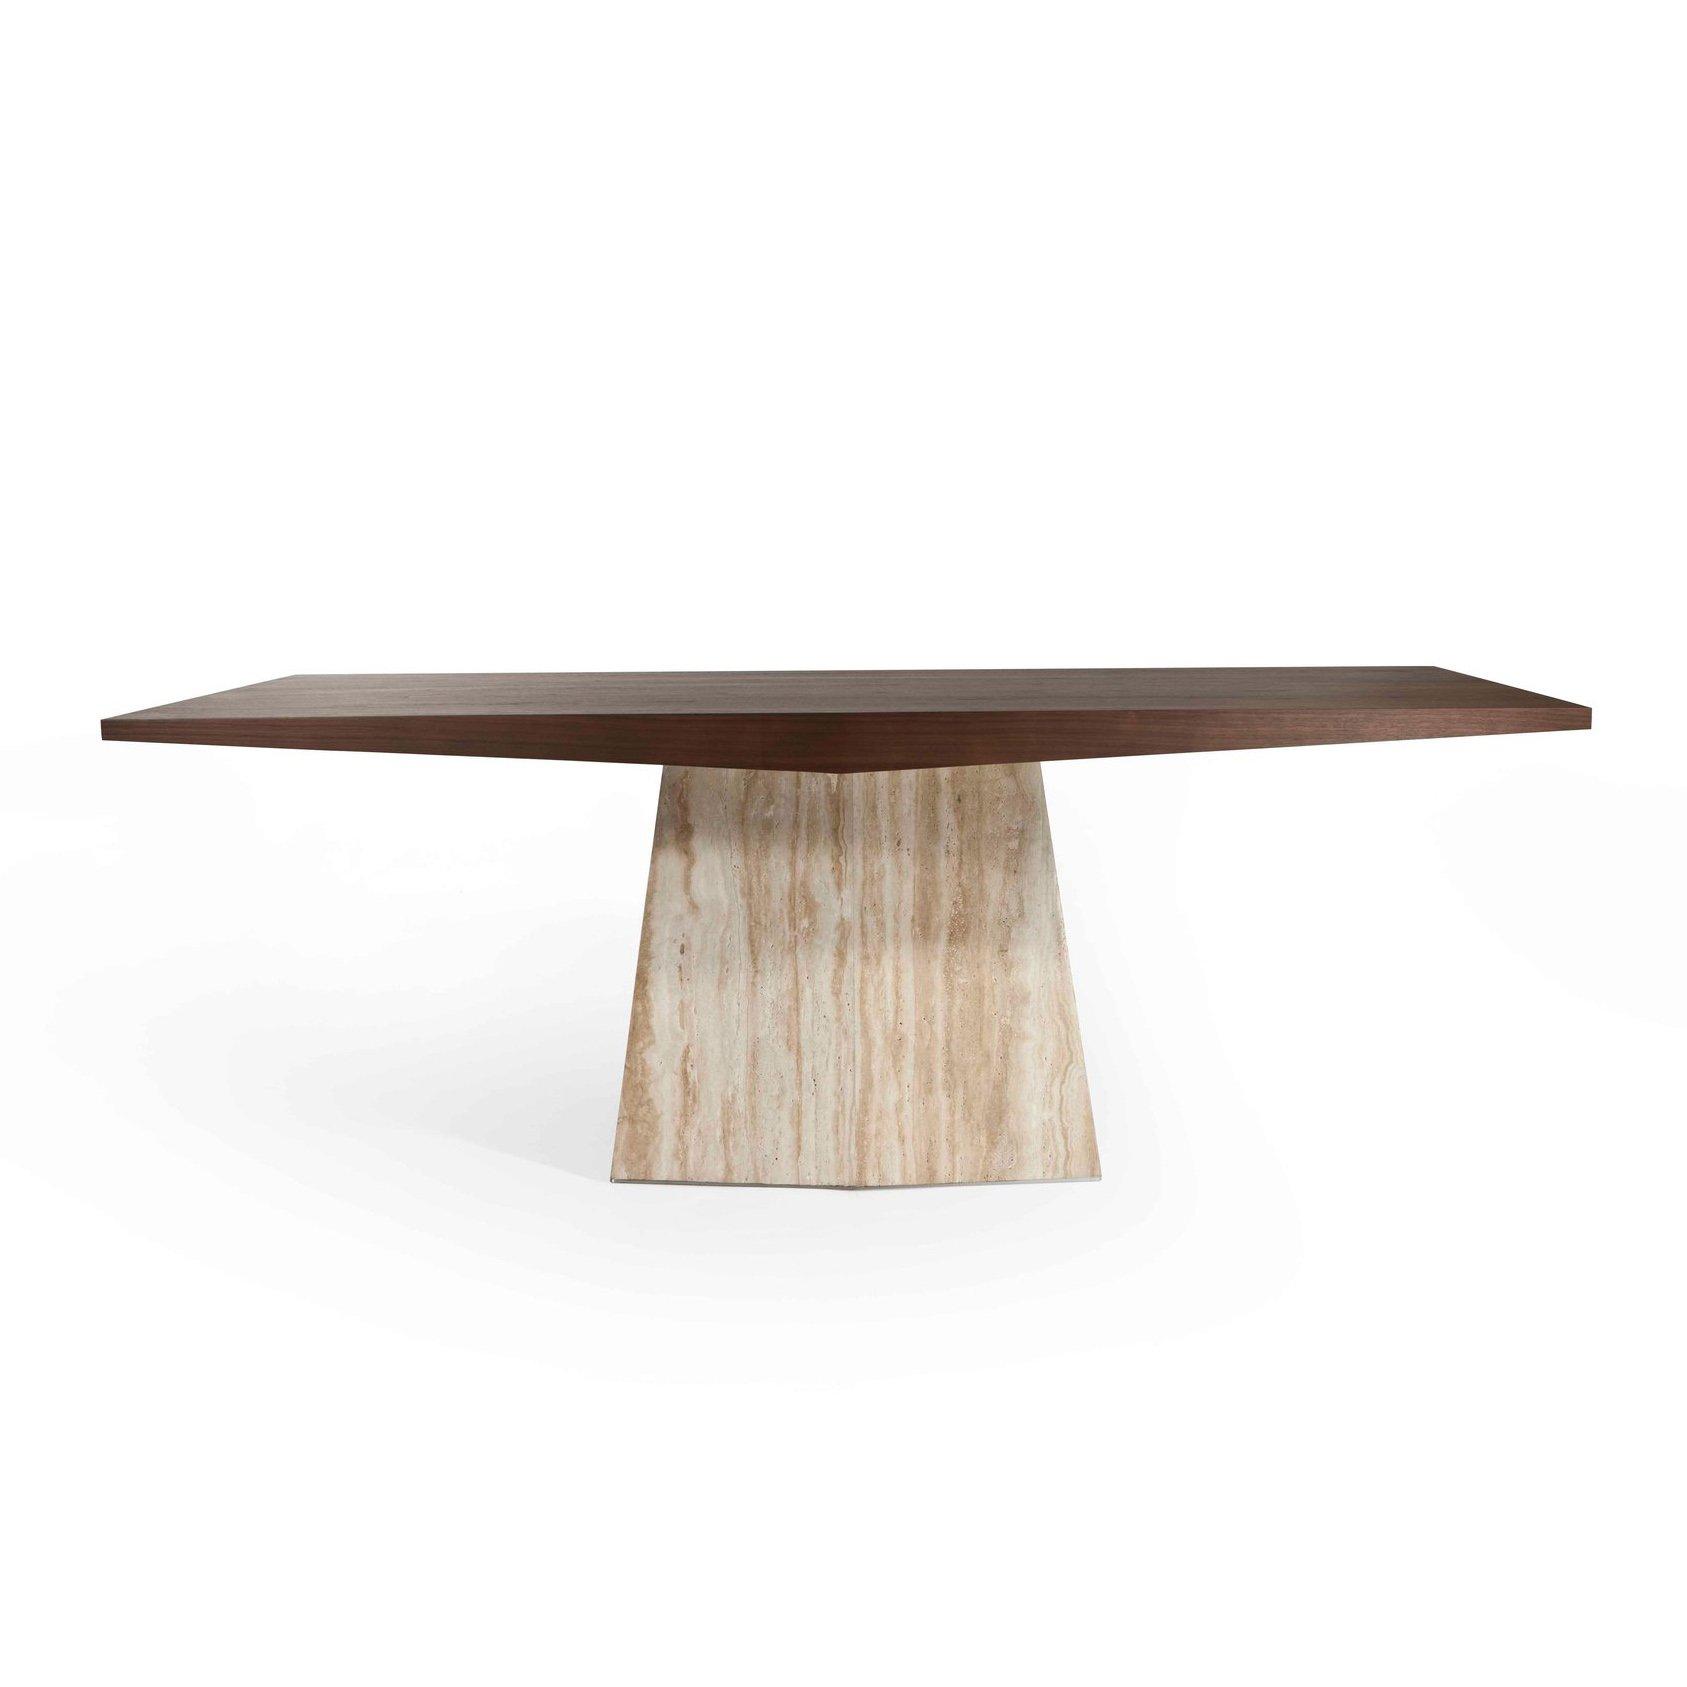 Italo Table | Sean Dix